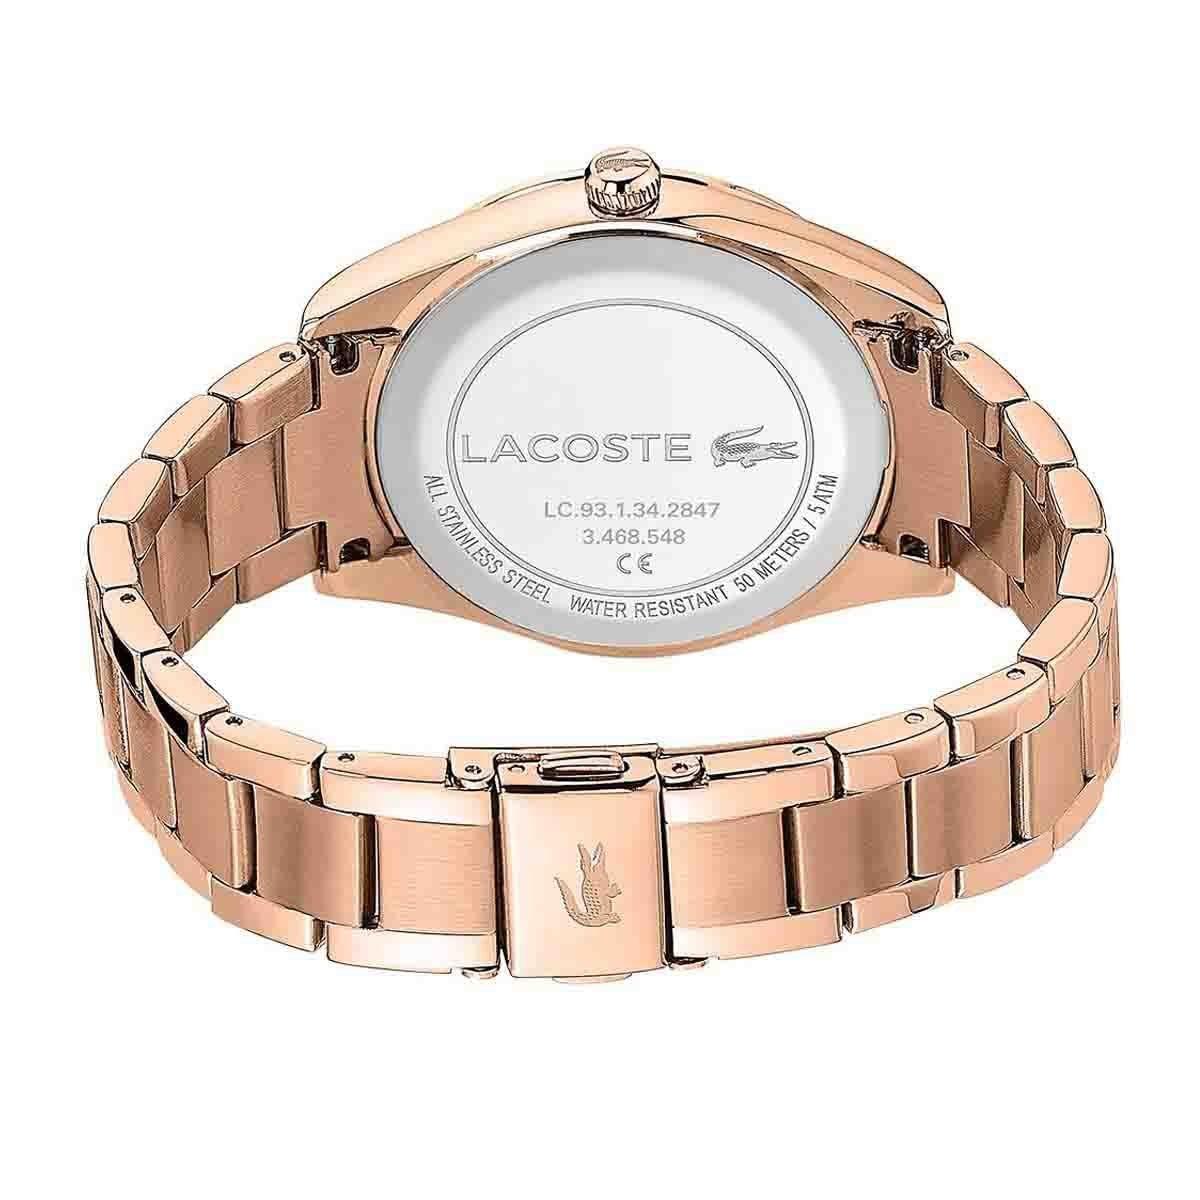 Reloj para Dama Parisienne Color Oro Lacoste